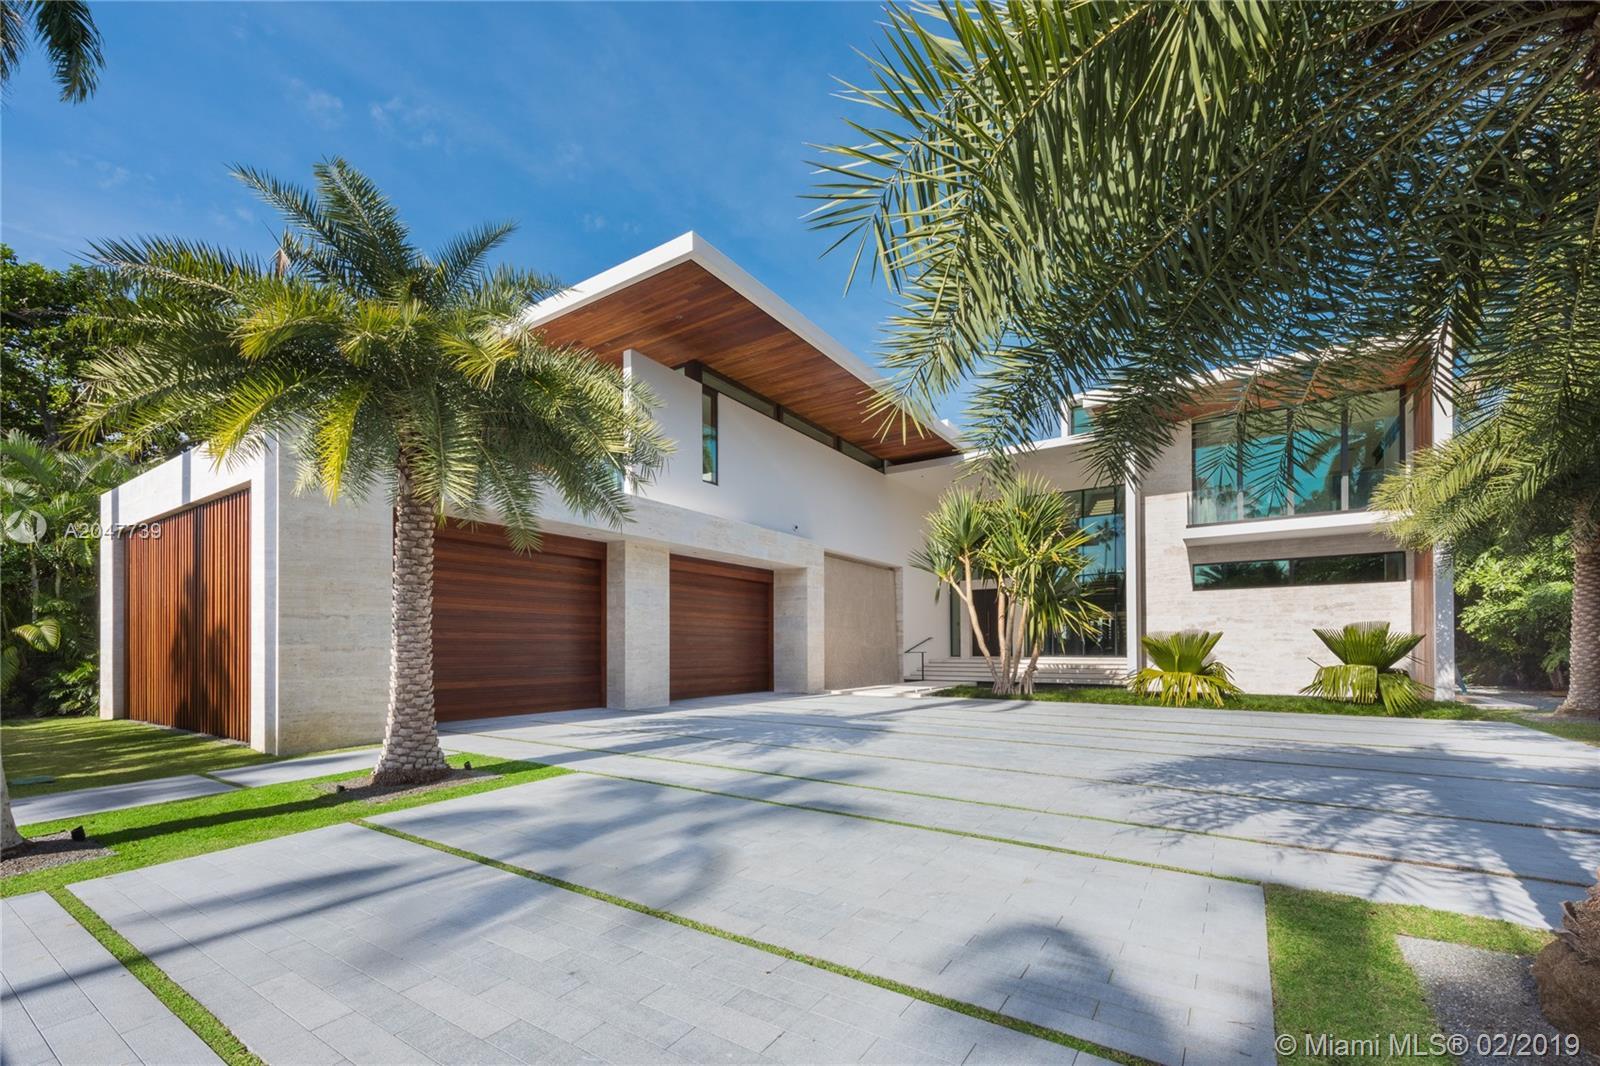 73 Palm av- miami-beach--fl-33139-a2047739-Pic01